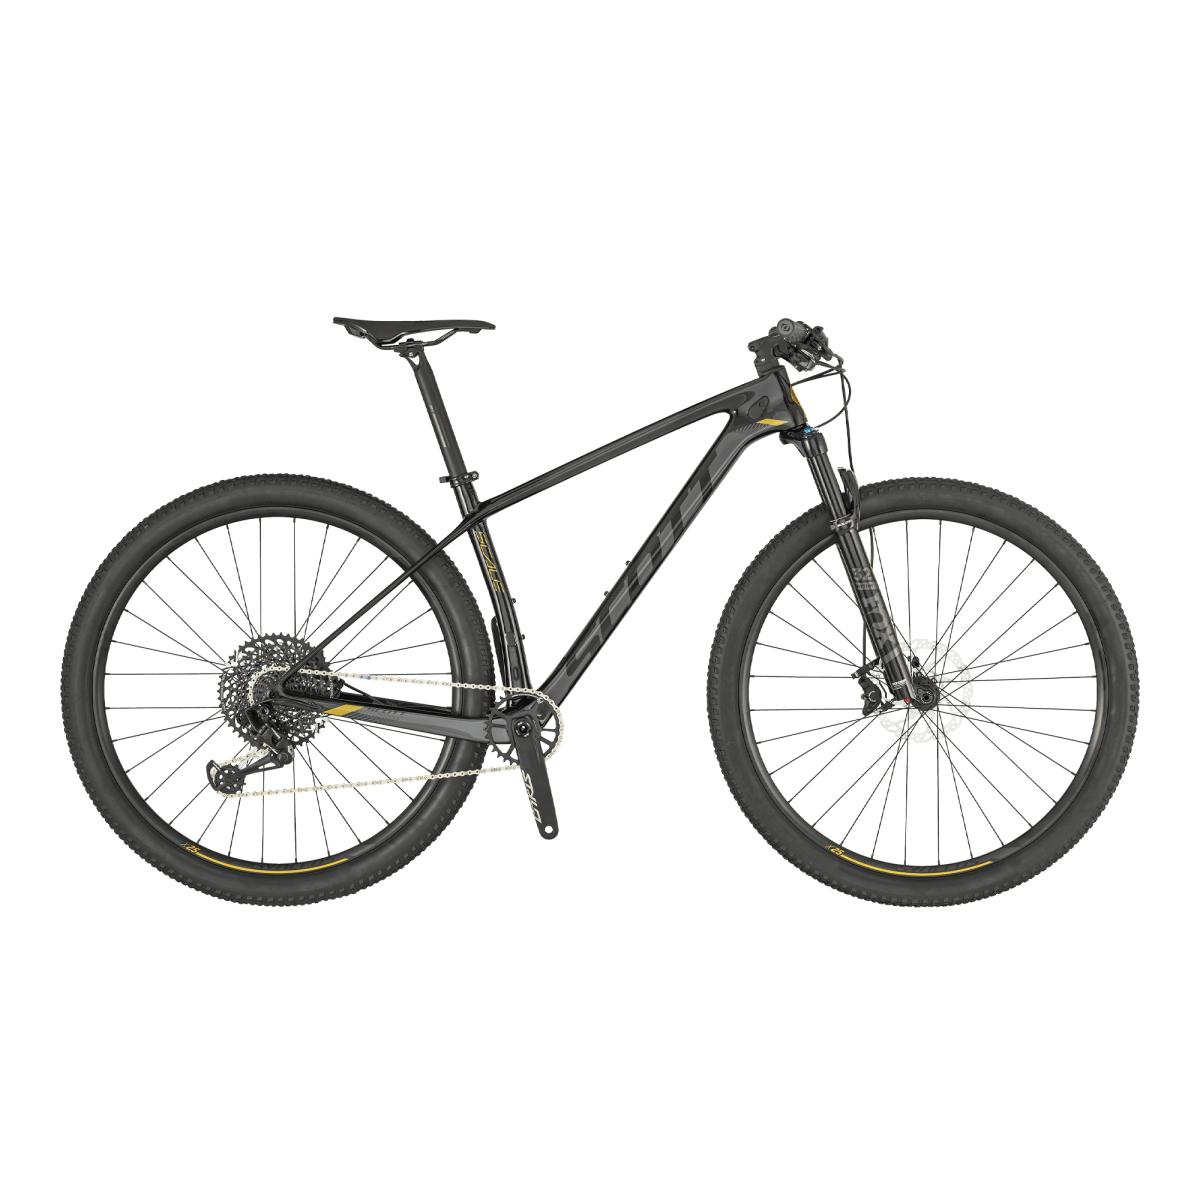 Scott Scale 920 mountain bike 2019